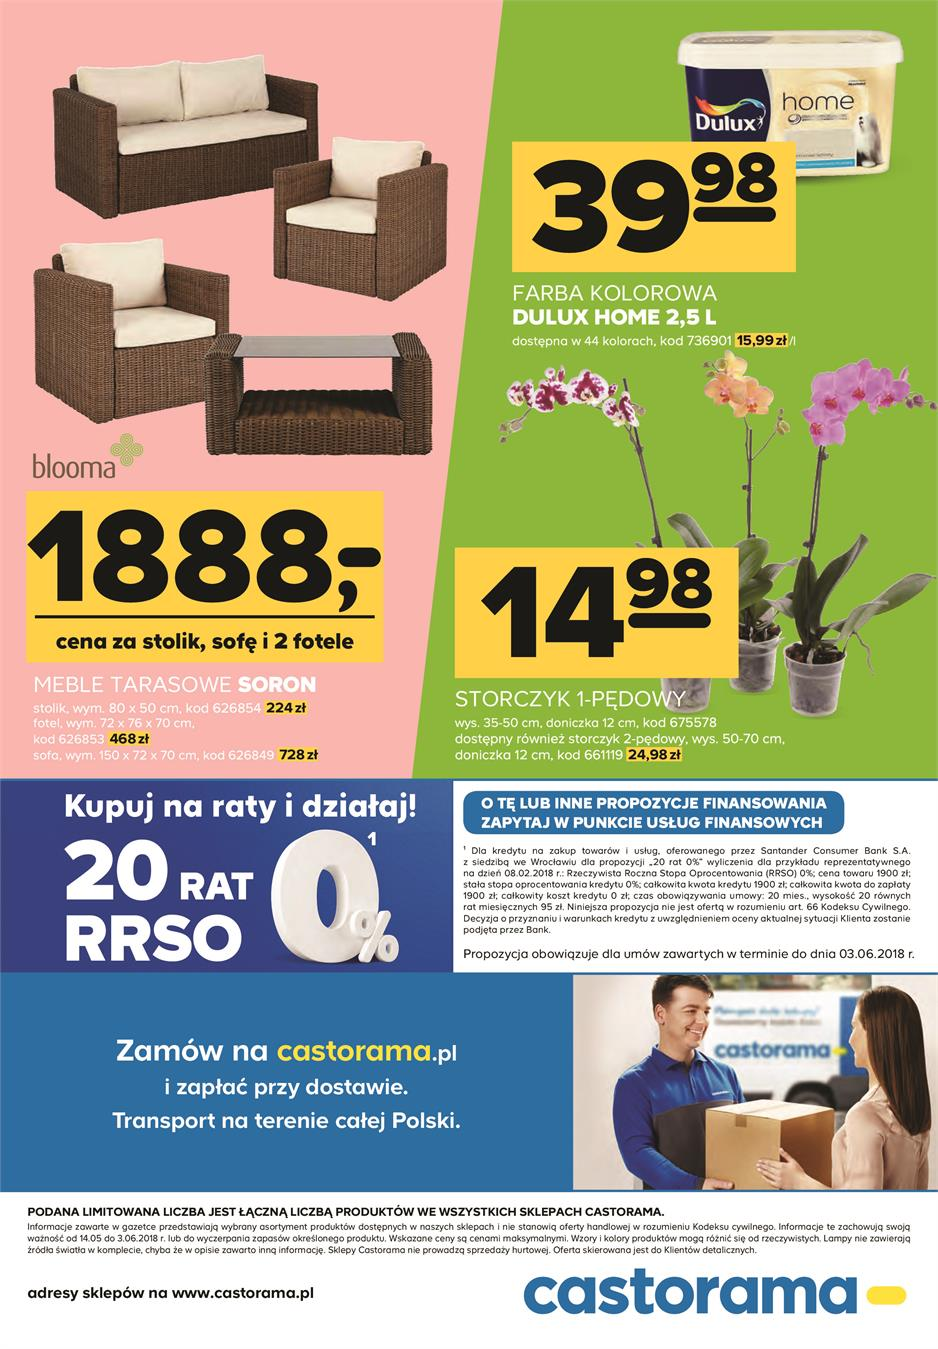 Gazetka Promocyjna Castoramapl Katalog Dom I Ogród Maj